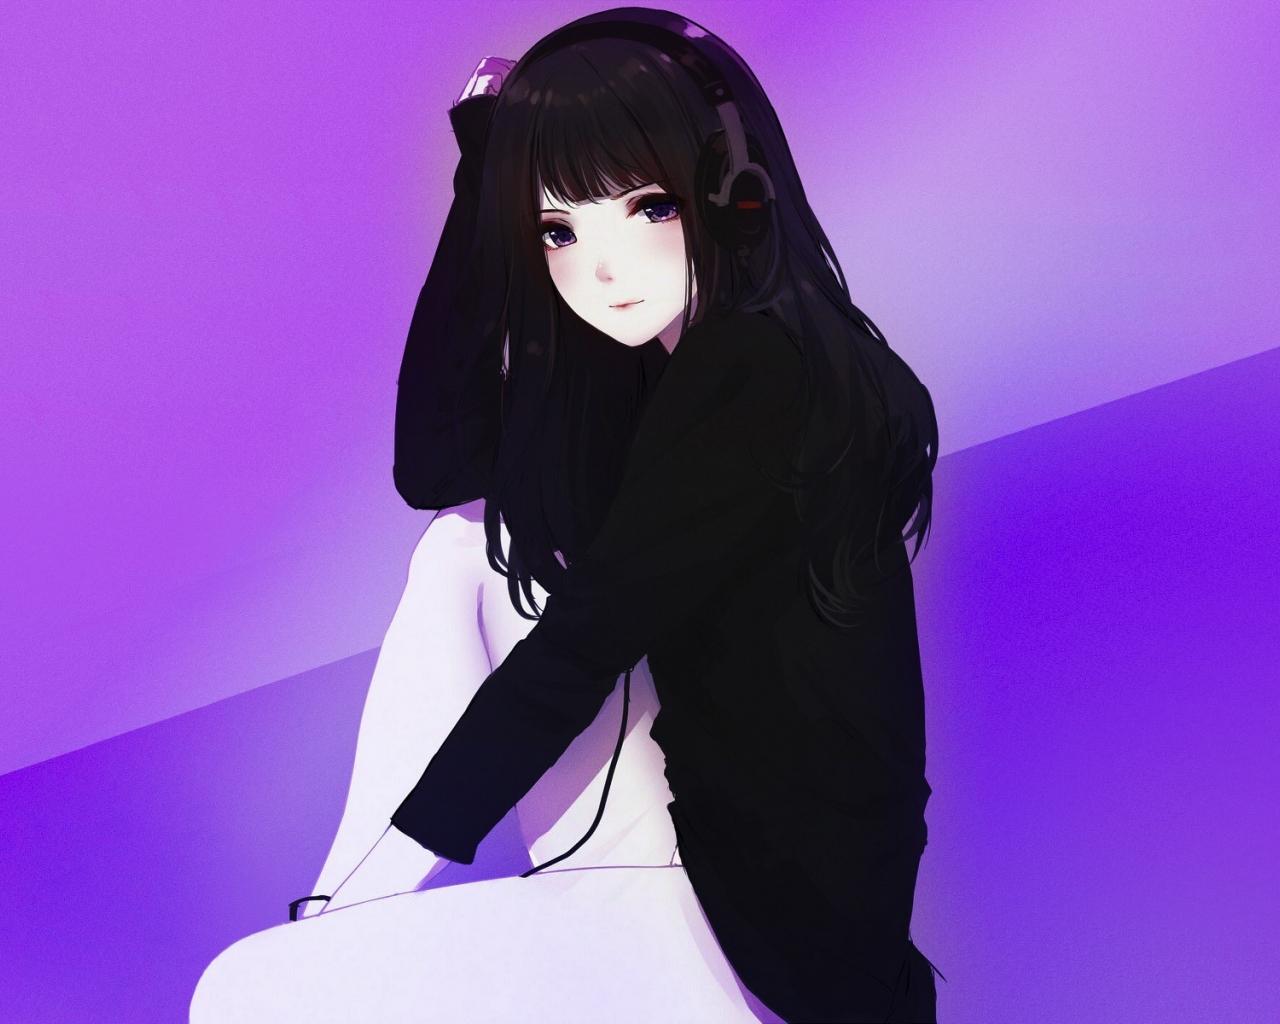 Headphone cute anime girl black hoodie 1280x1024 wallpaper